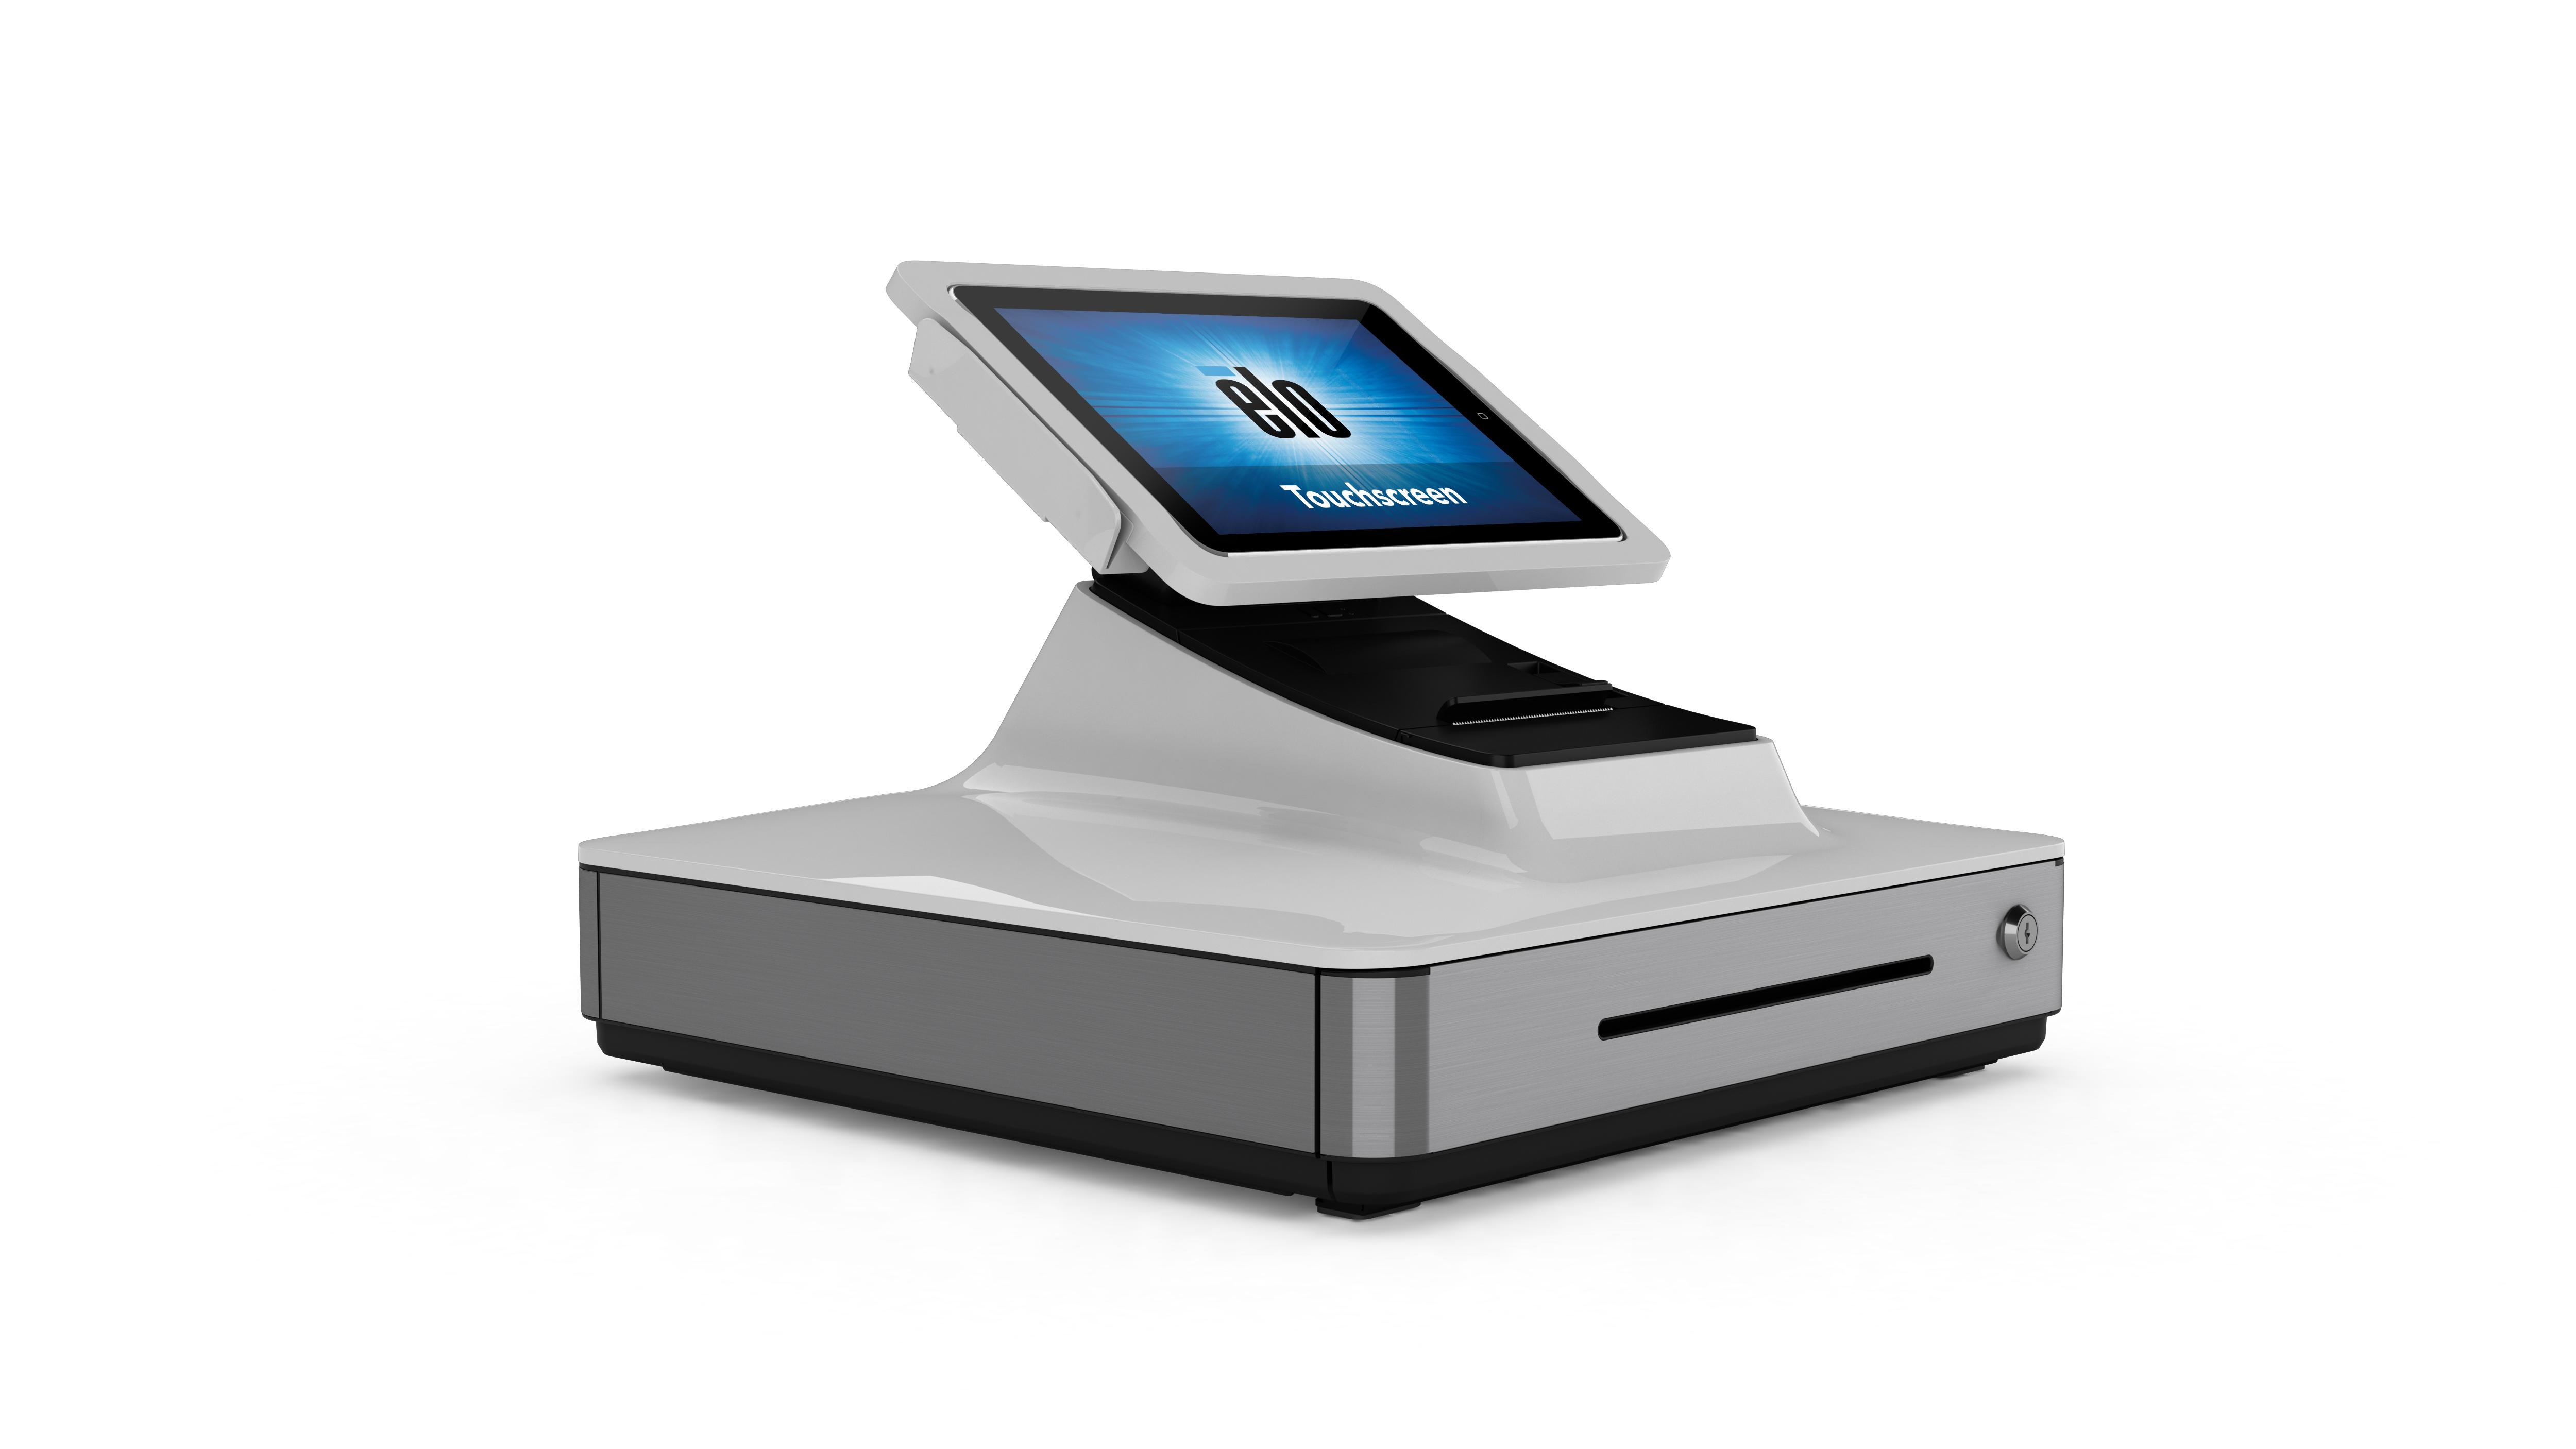 PP2_iPad_Right_iPad-air